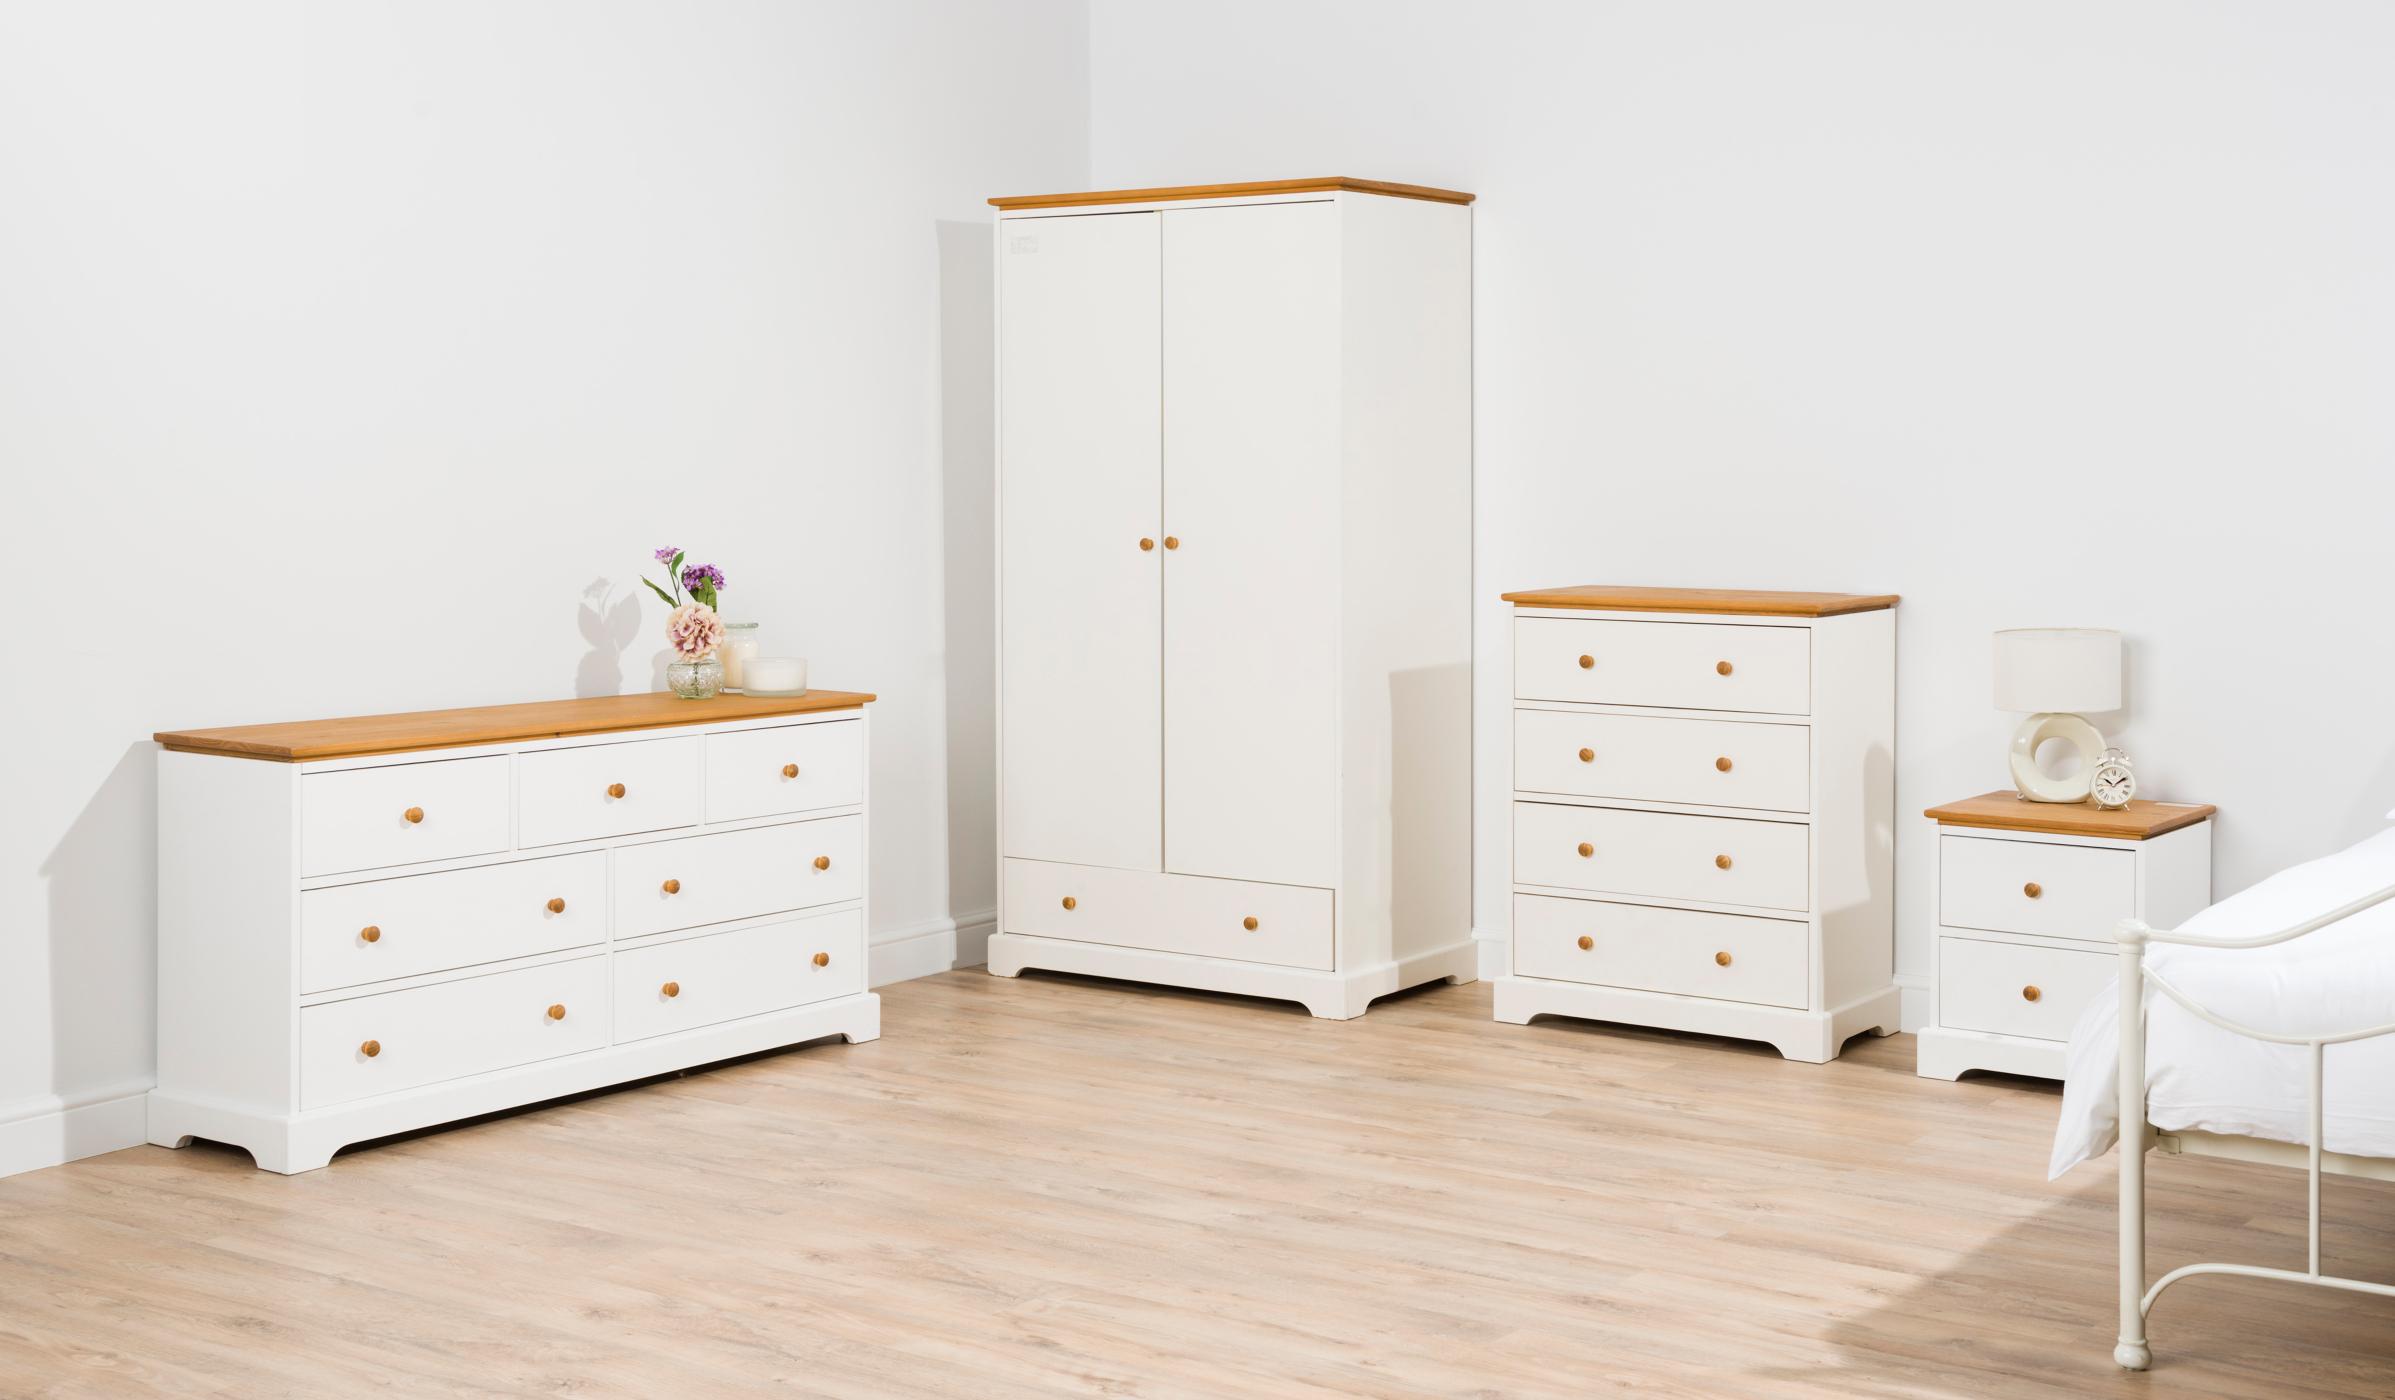 gilmore bedroom furniture range - two tone | bedroom | george at asda